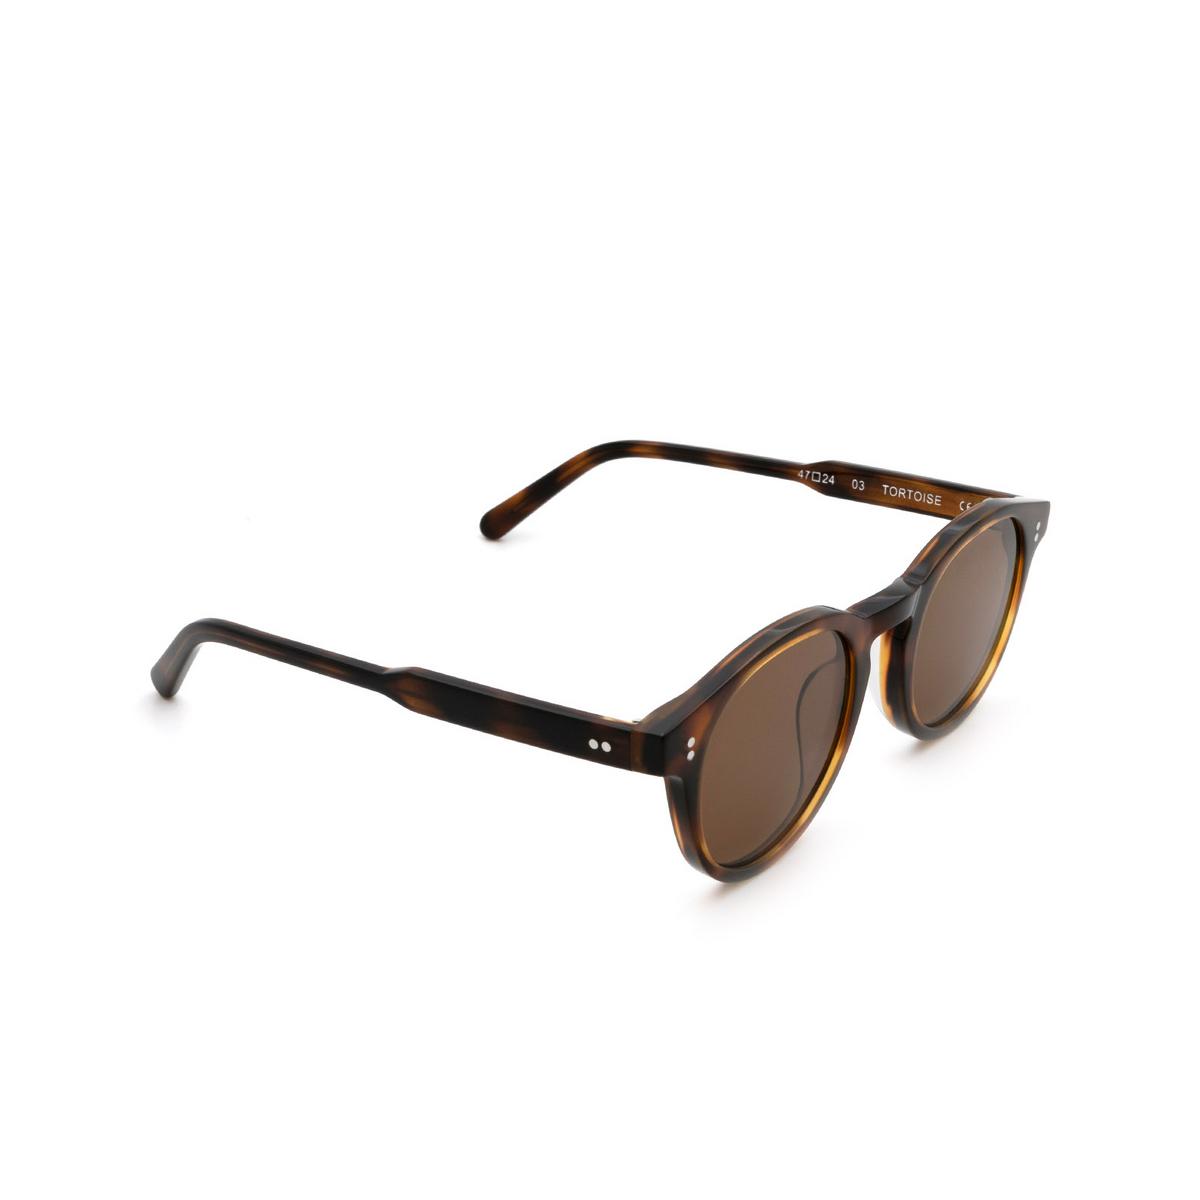 Chimi® Round Sunglasses: 03 color Tortoise.